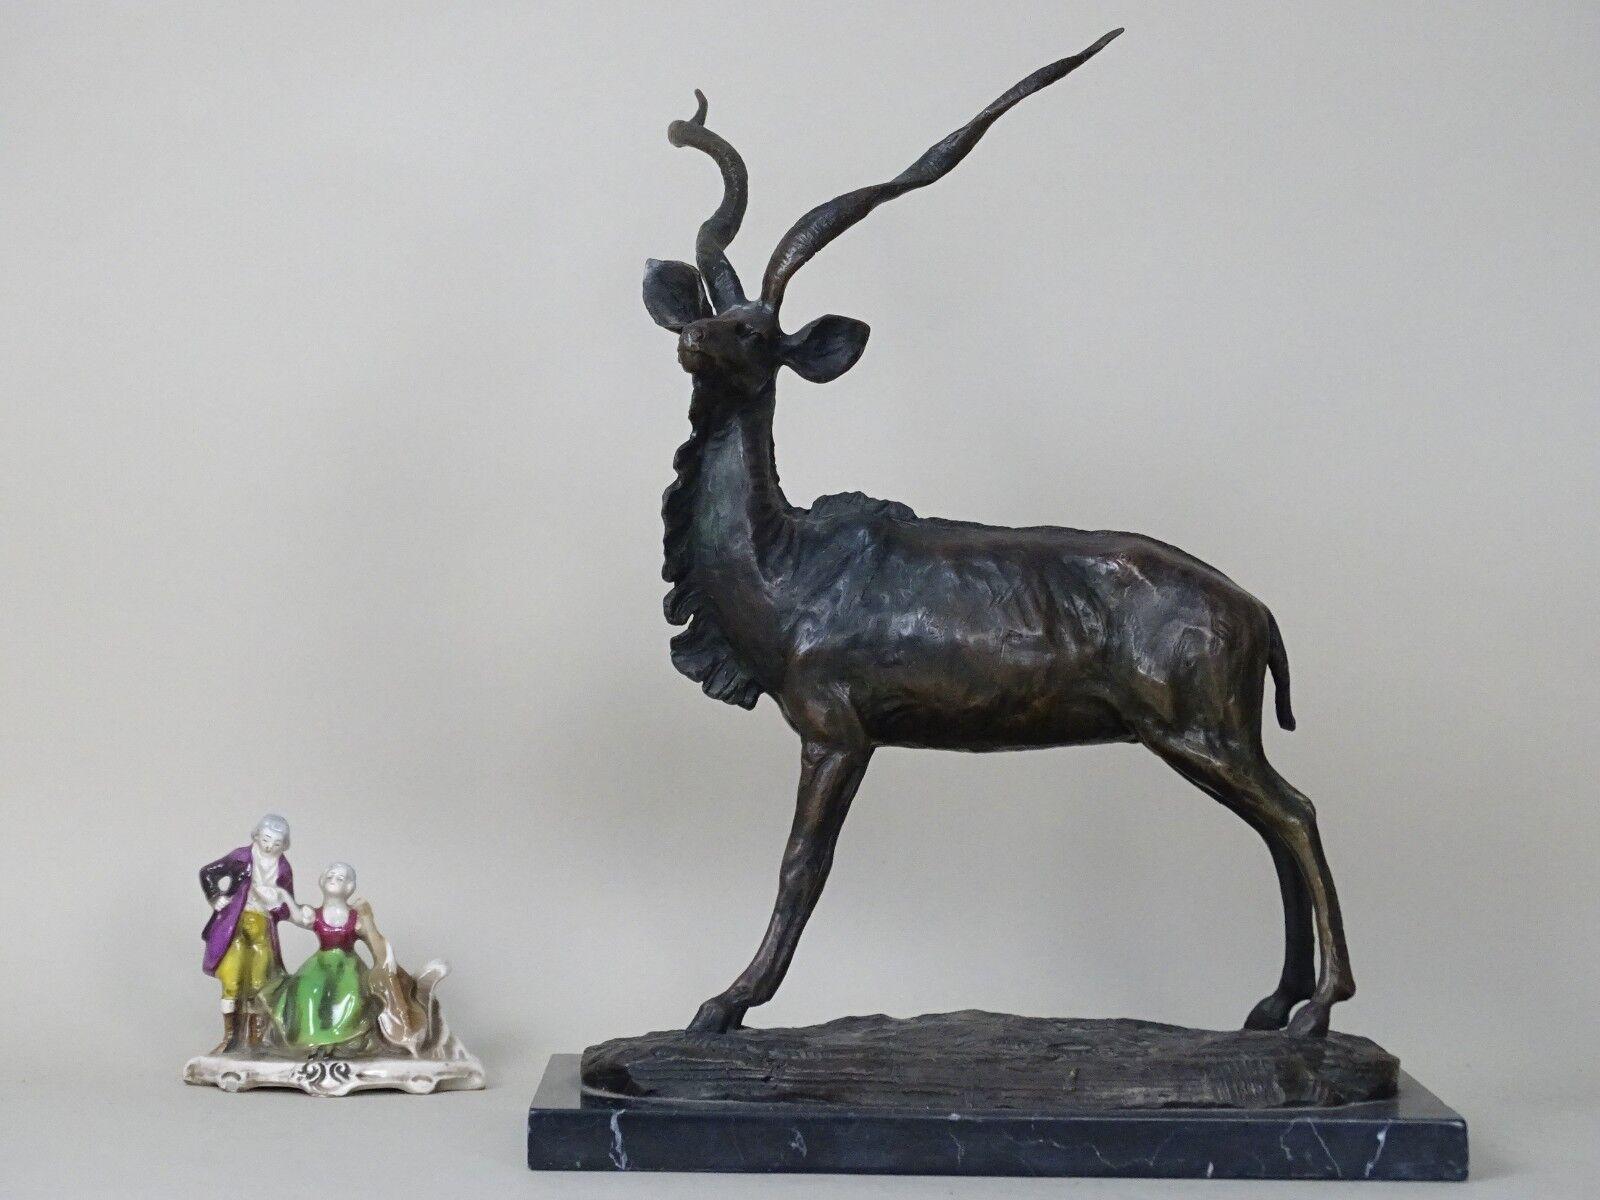 SCULTURA BRONZO marmo ANTILOPE CERVO MILO LIBERTY DECO 1800 XIX s MOREAU FRANCIA